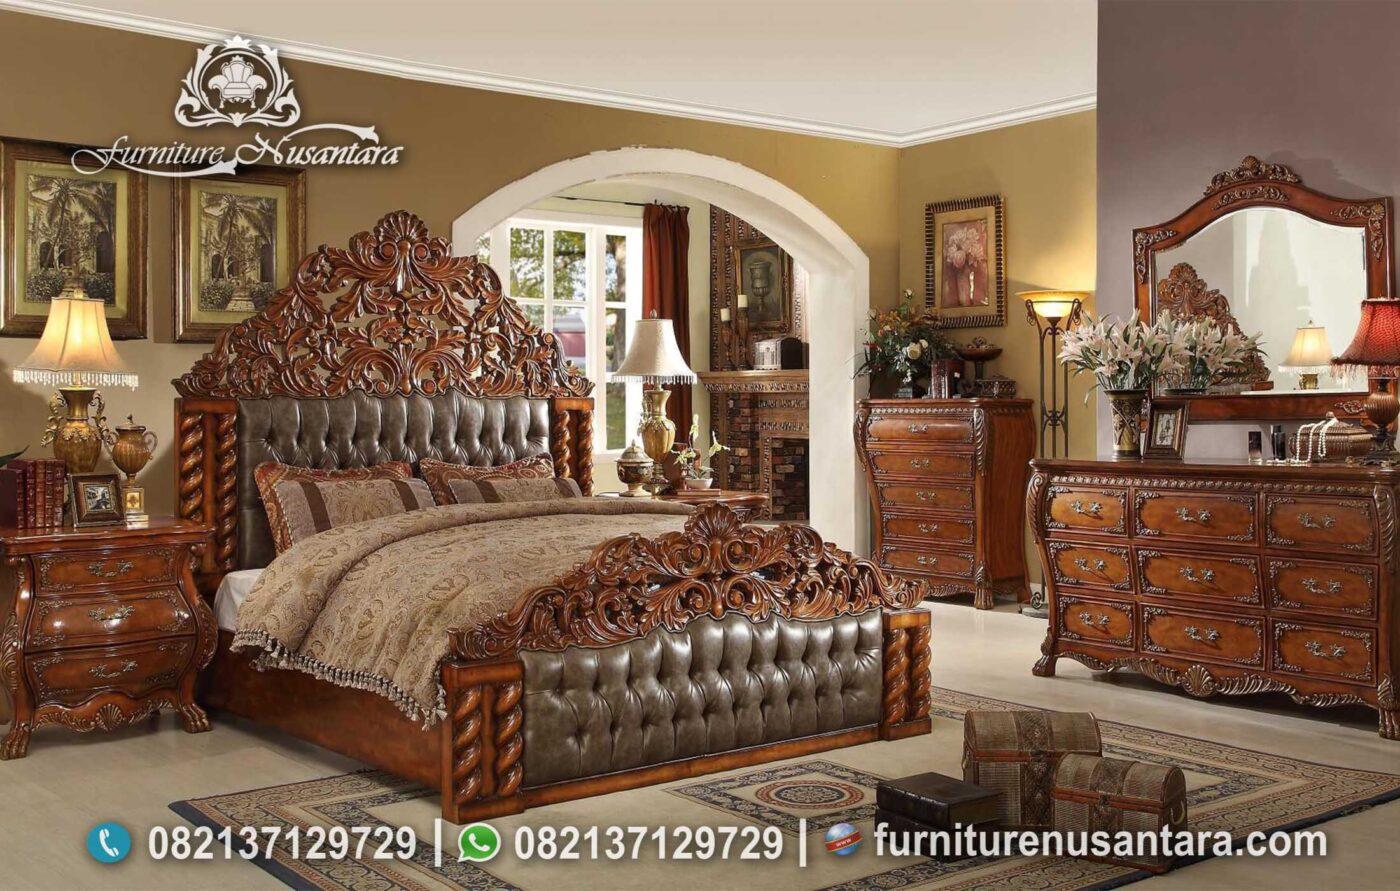 Set Kamar Tidur Kayu Jati Natural KS-191, Furniture Nusantara